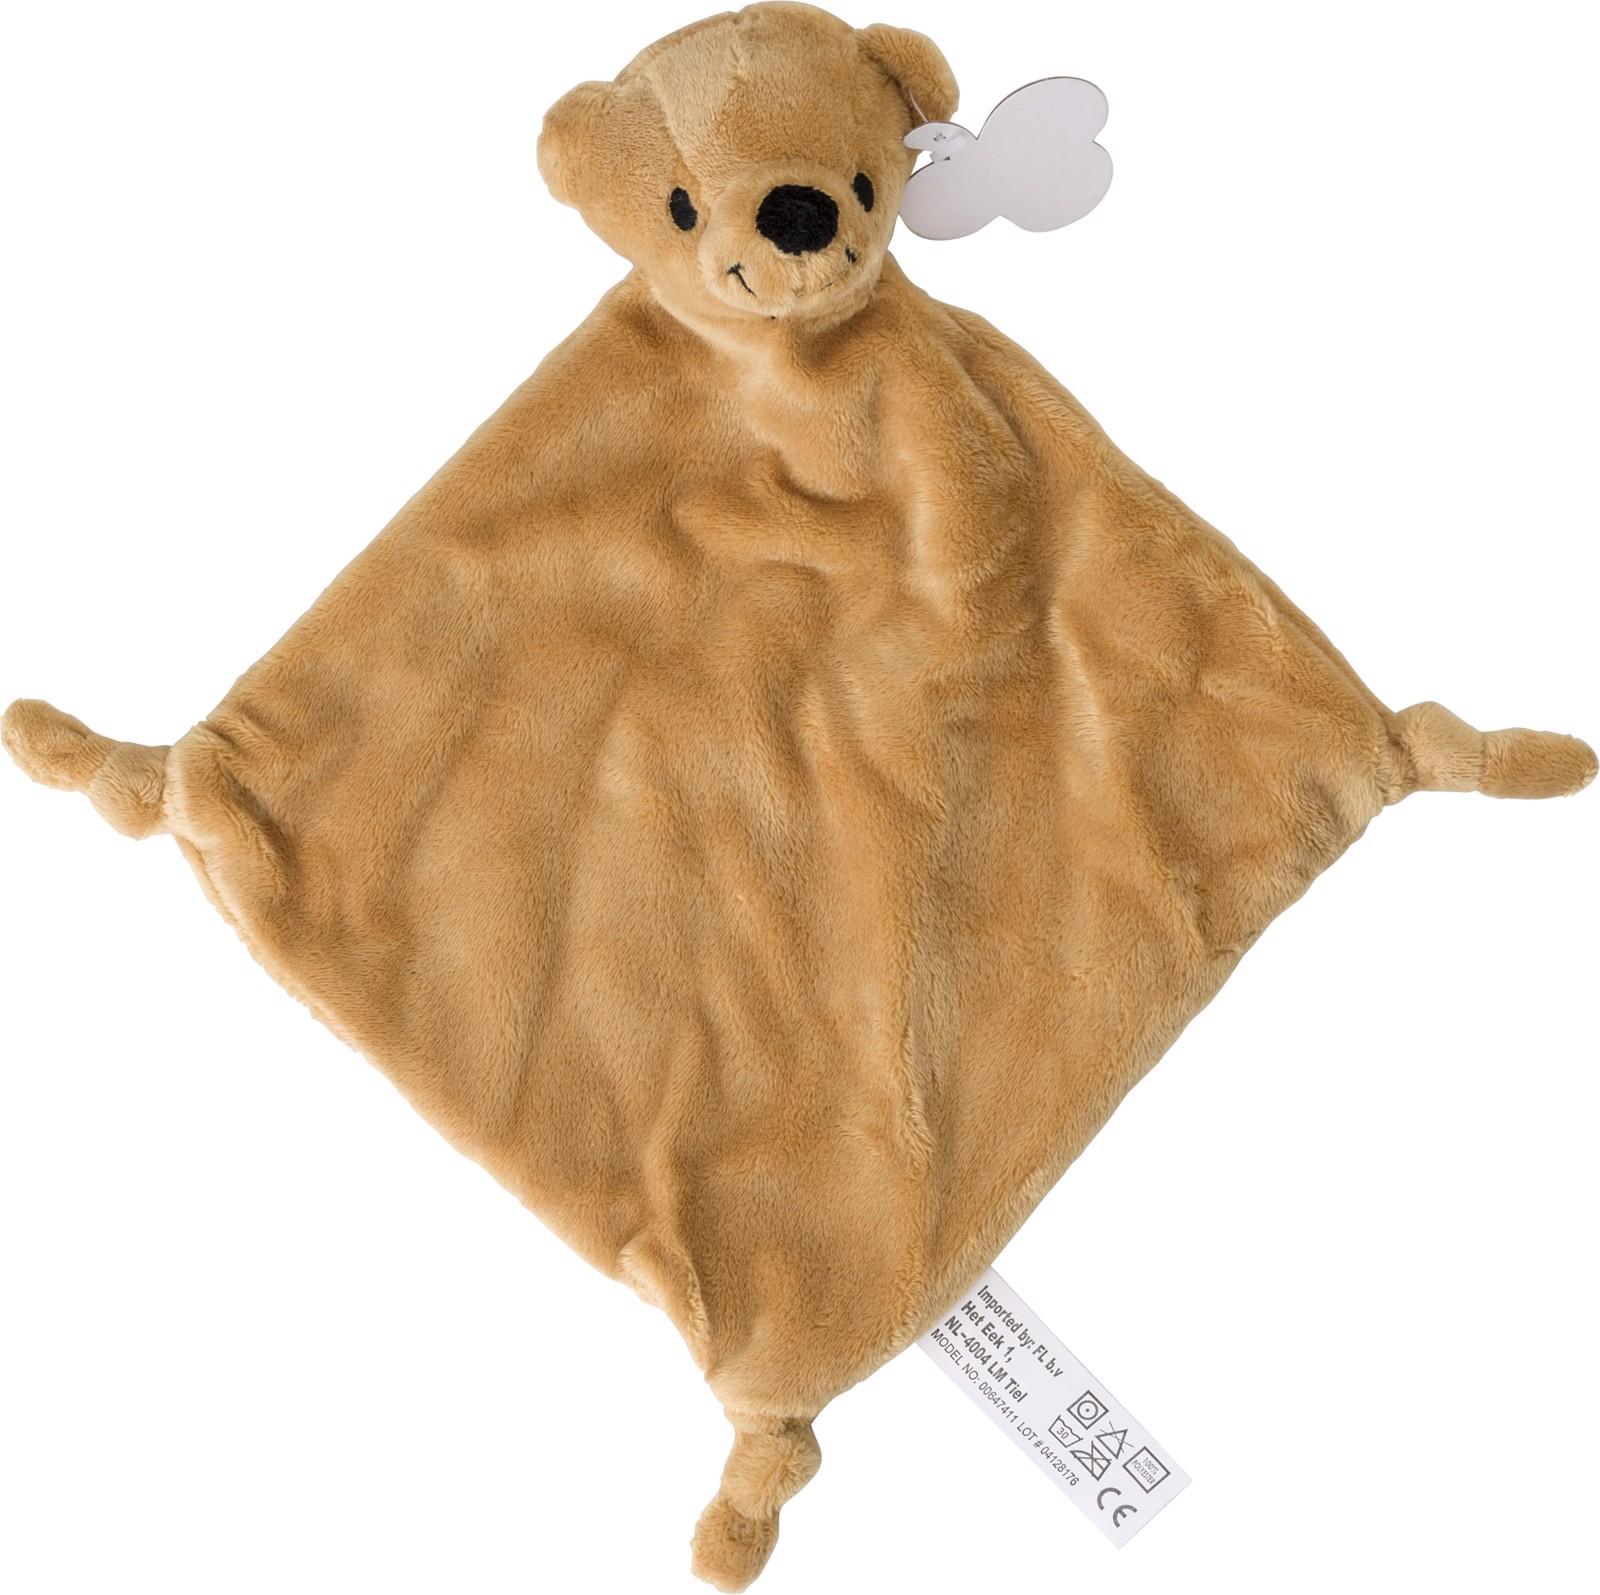 Plush cloth - Brown